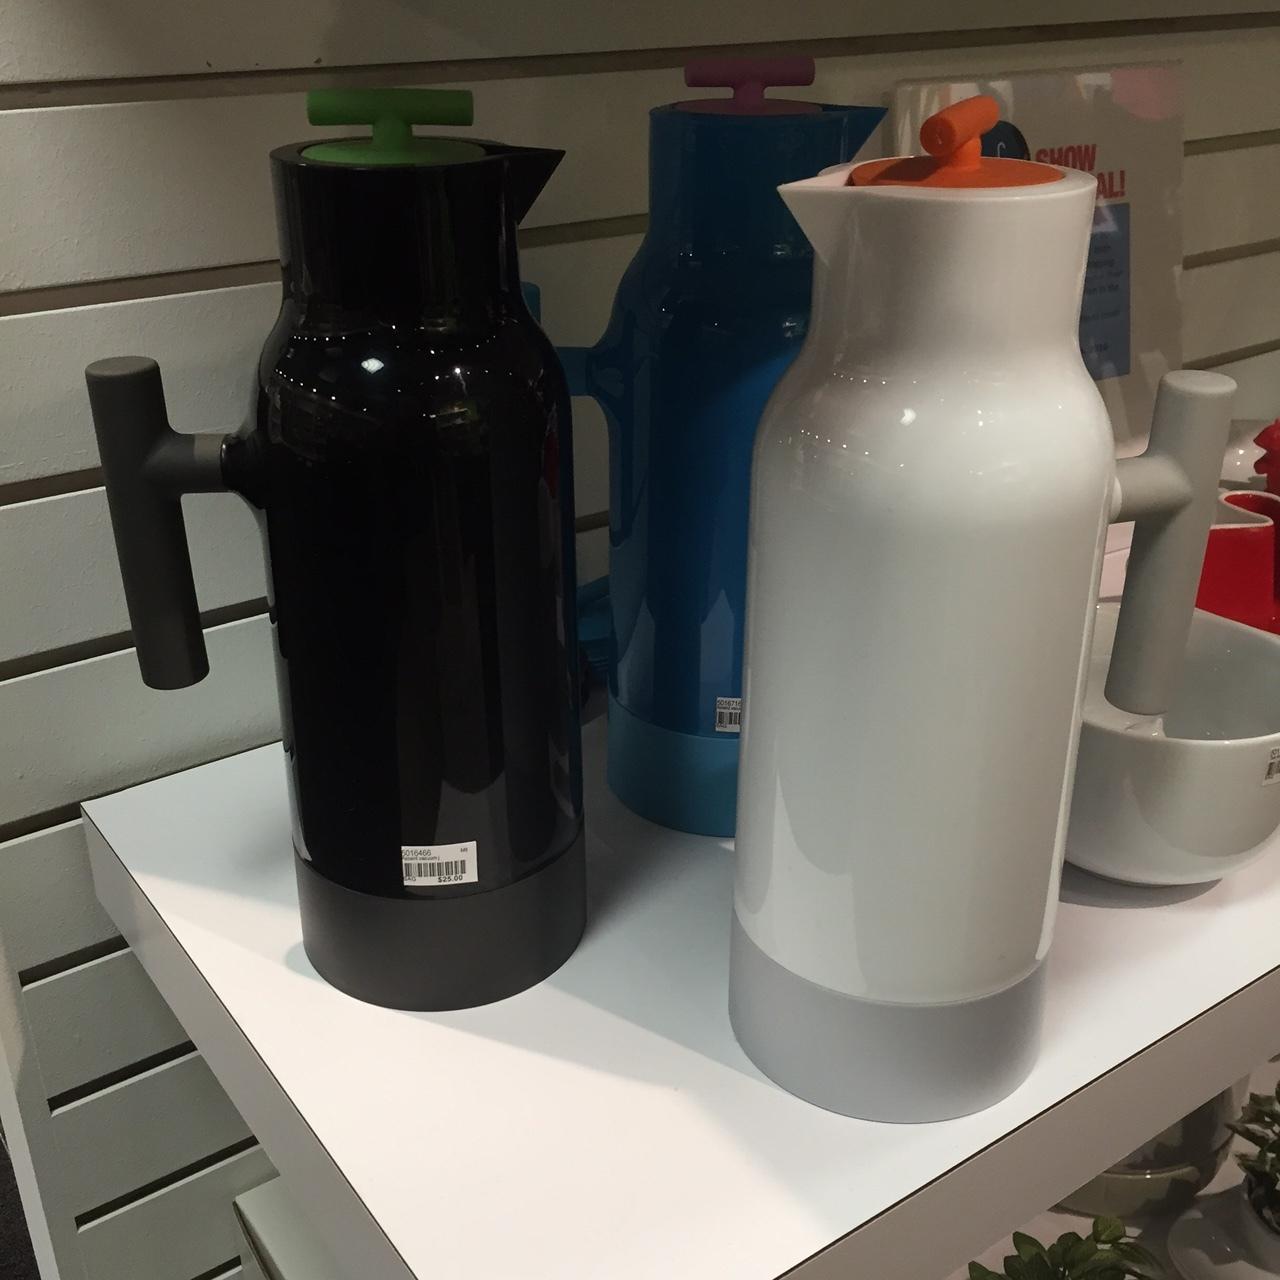 Sagaform: Accent coffee pots